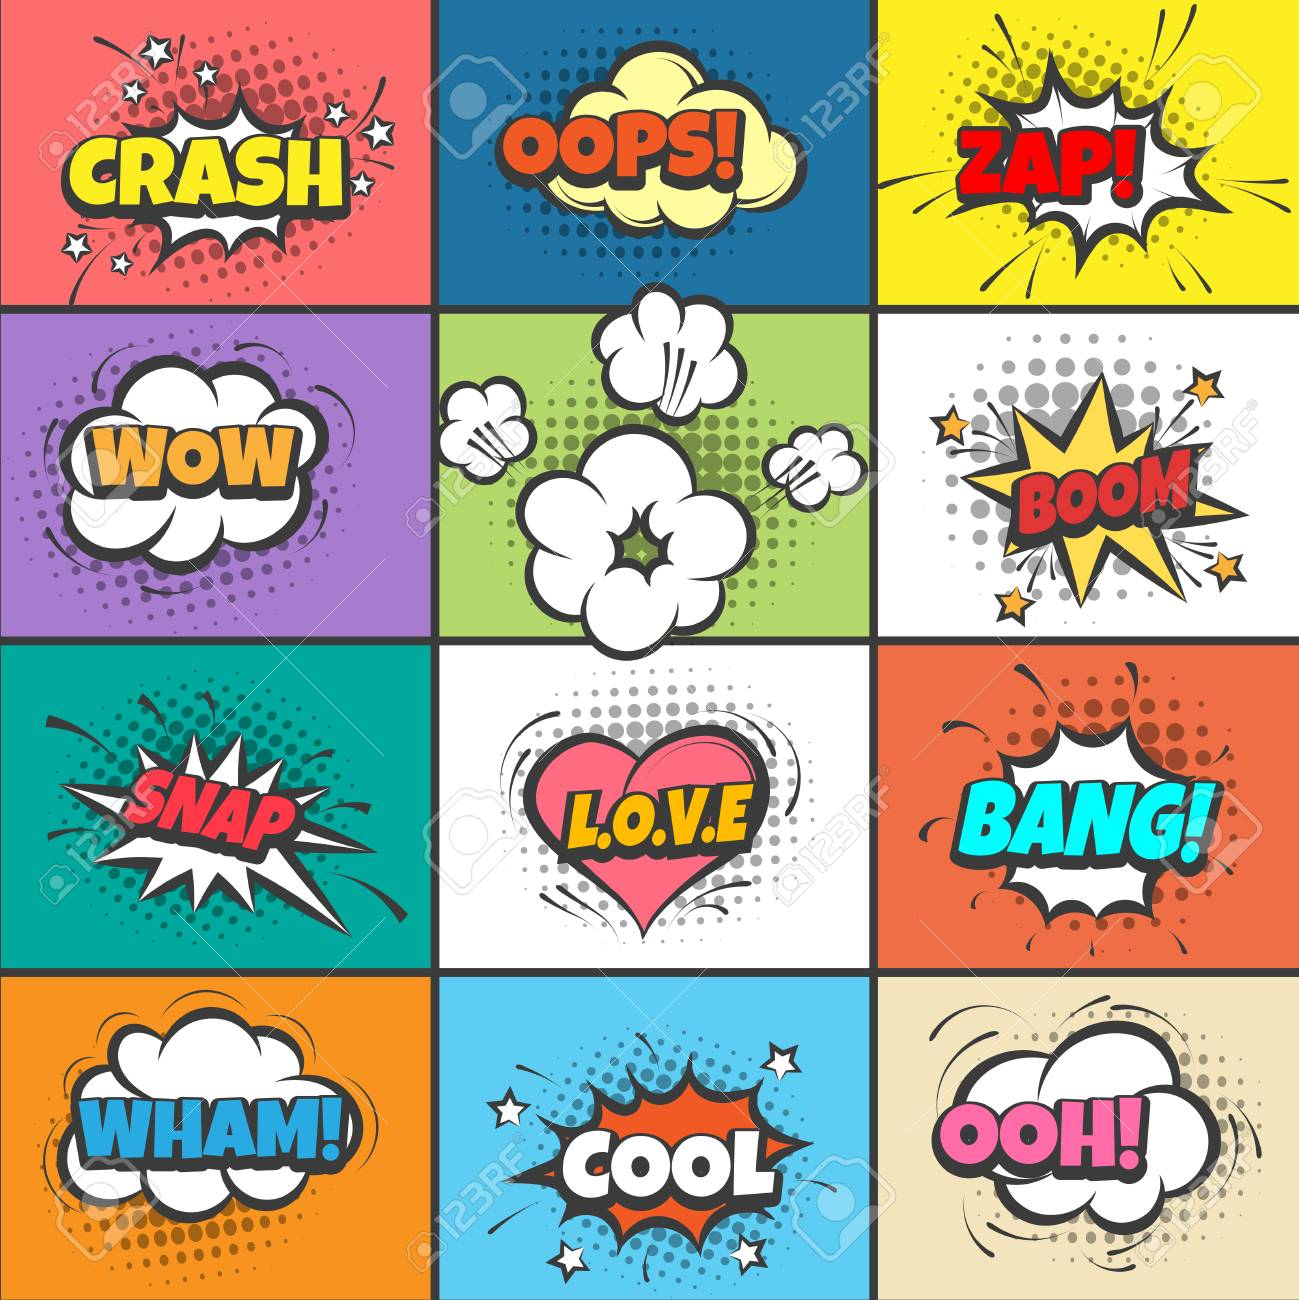 Comic pow bubbles  Cartoon bang and crash, wow and boom, oops